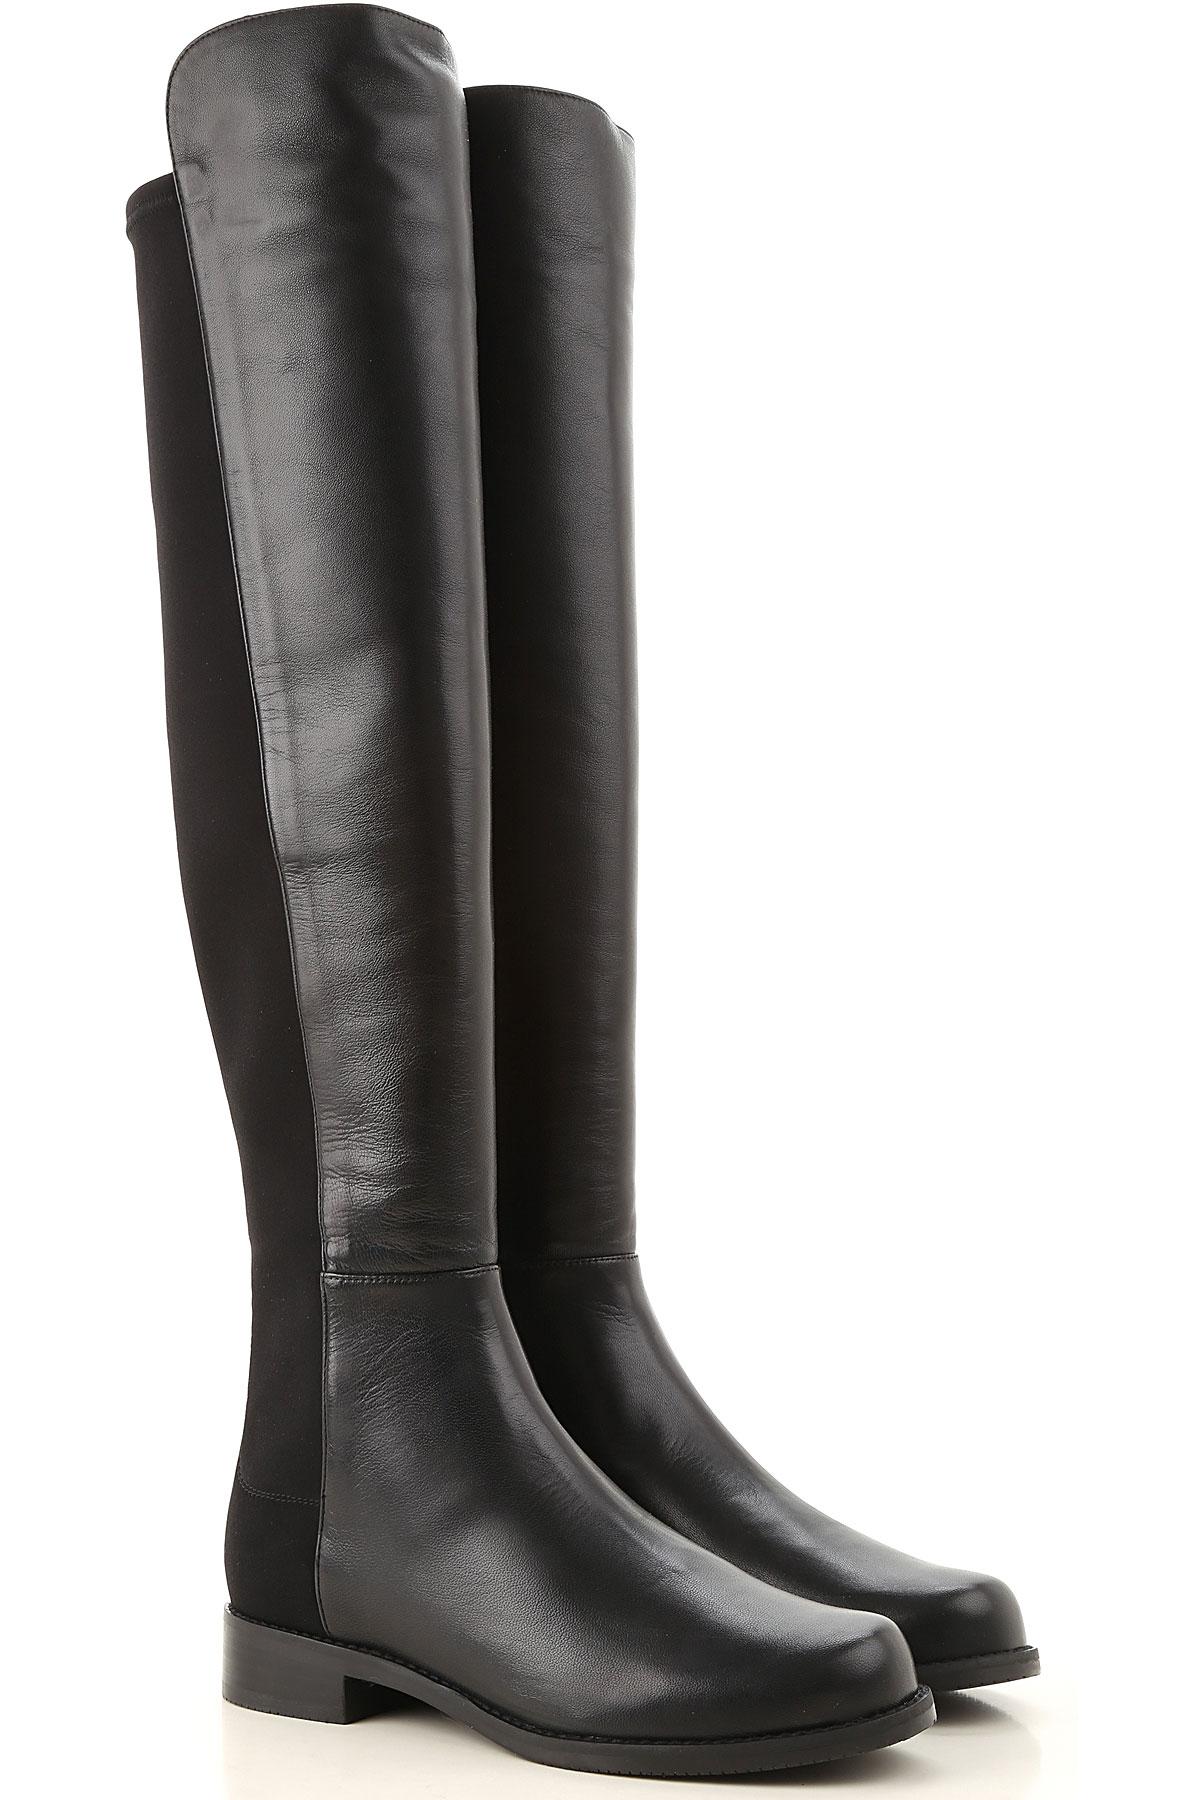 Stuart Weitzman Boots for Women, Booties On Sale, Black, Leather, 2019, US 4.5 ( EU 35) US 5 (EU 35.5) US 5.5 (EU 36) US 6 (EU 36.5) US 6.5 (EU 37) US